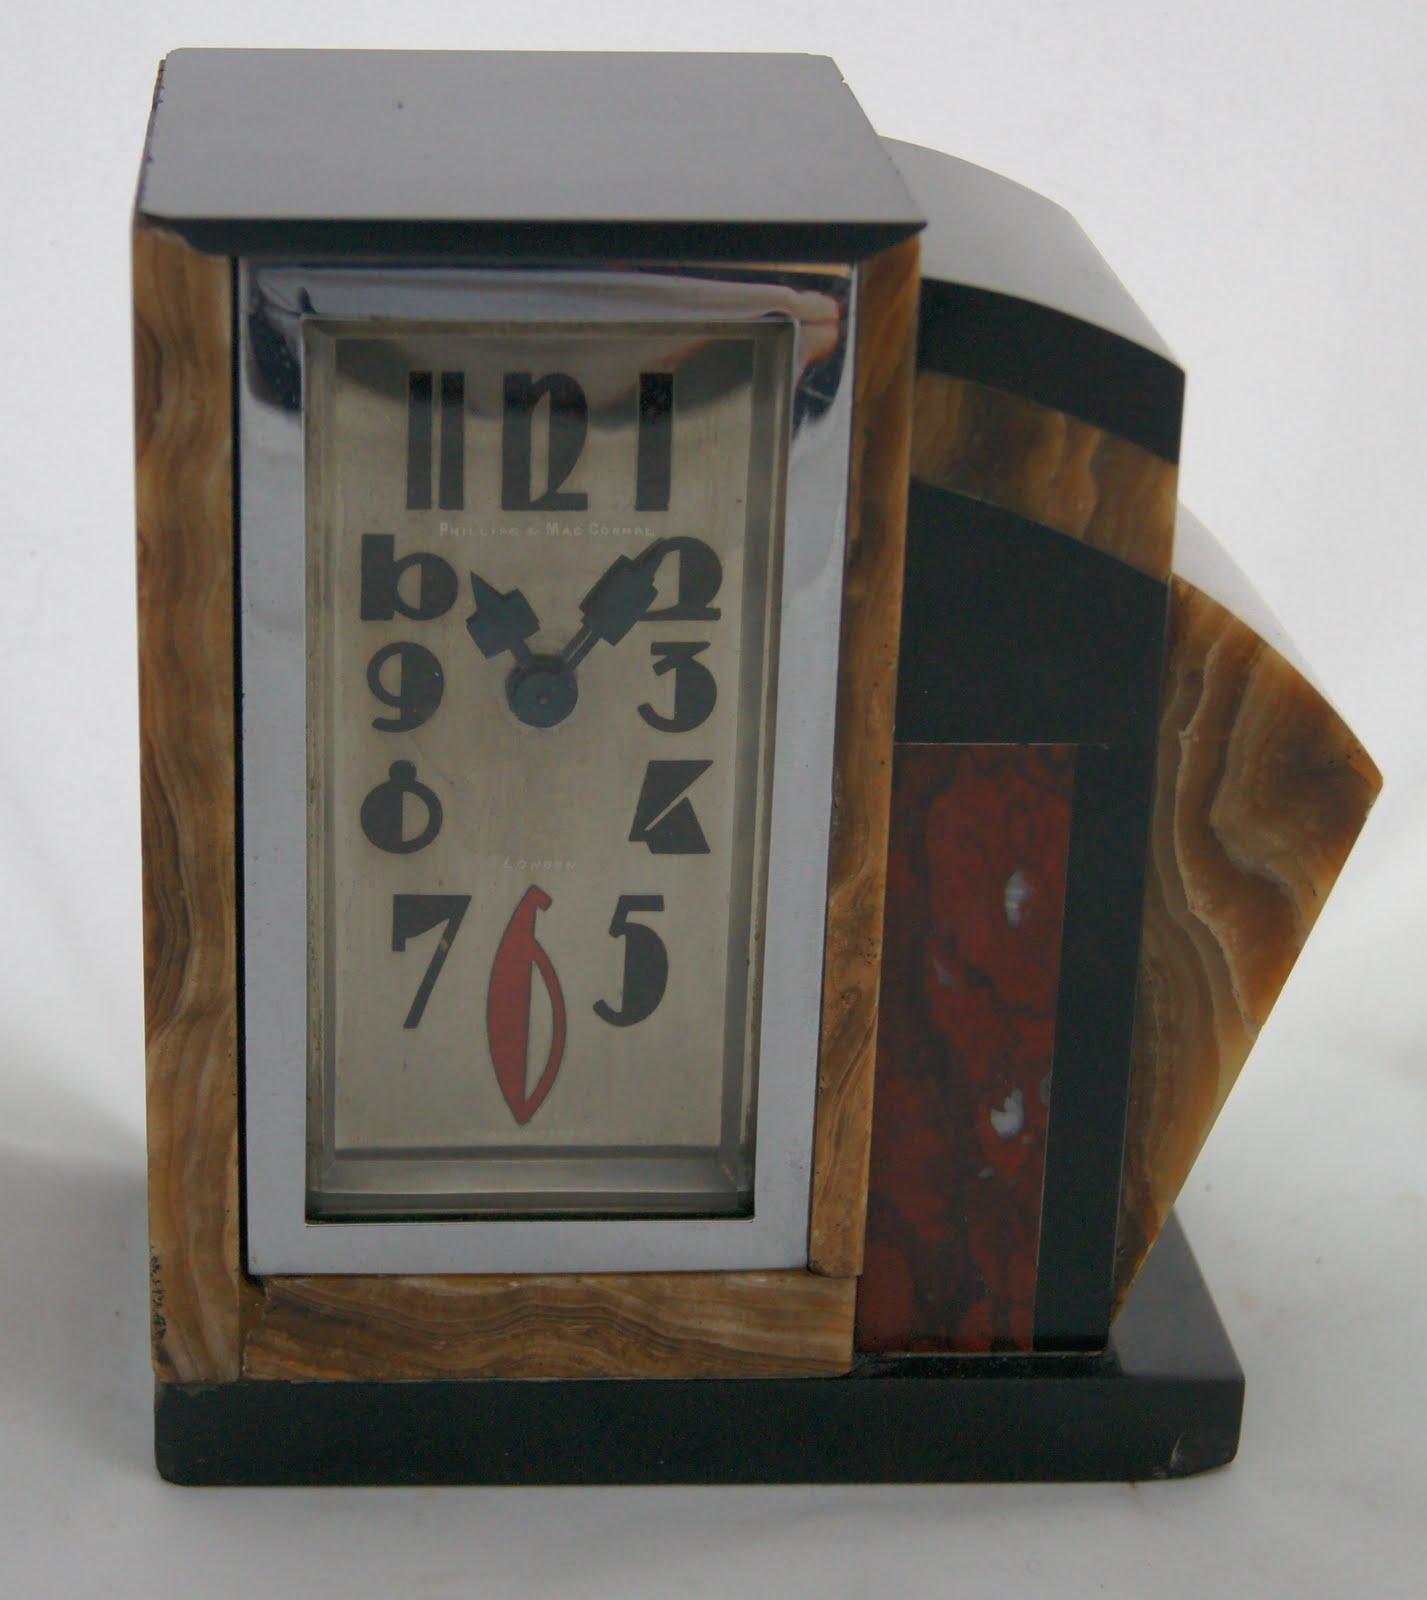 deco clocks charles hour diette hour hour lavigne and quot just quot clocks